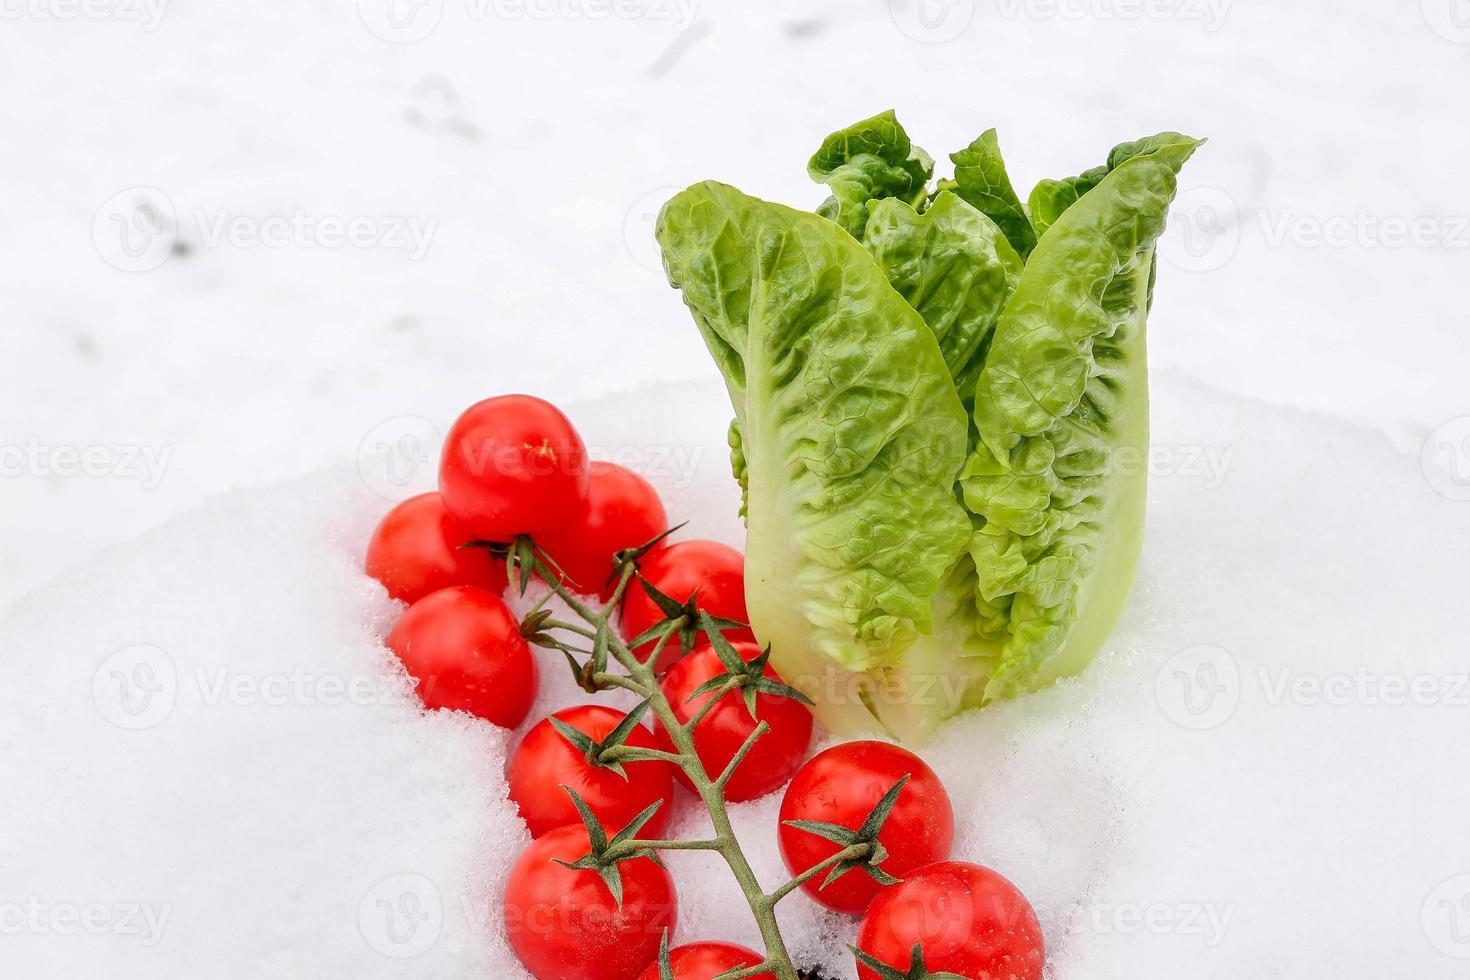 Winter vegetables photo